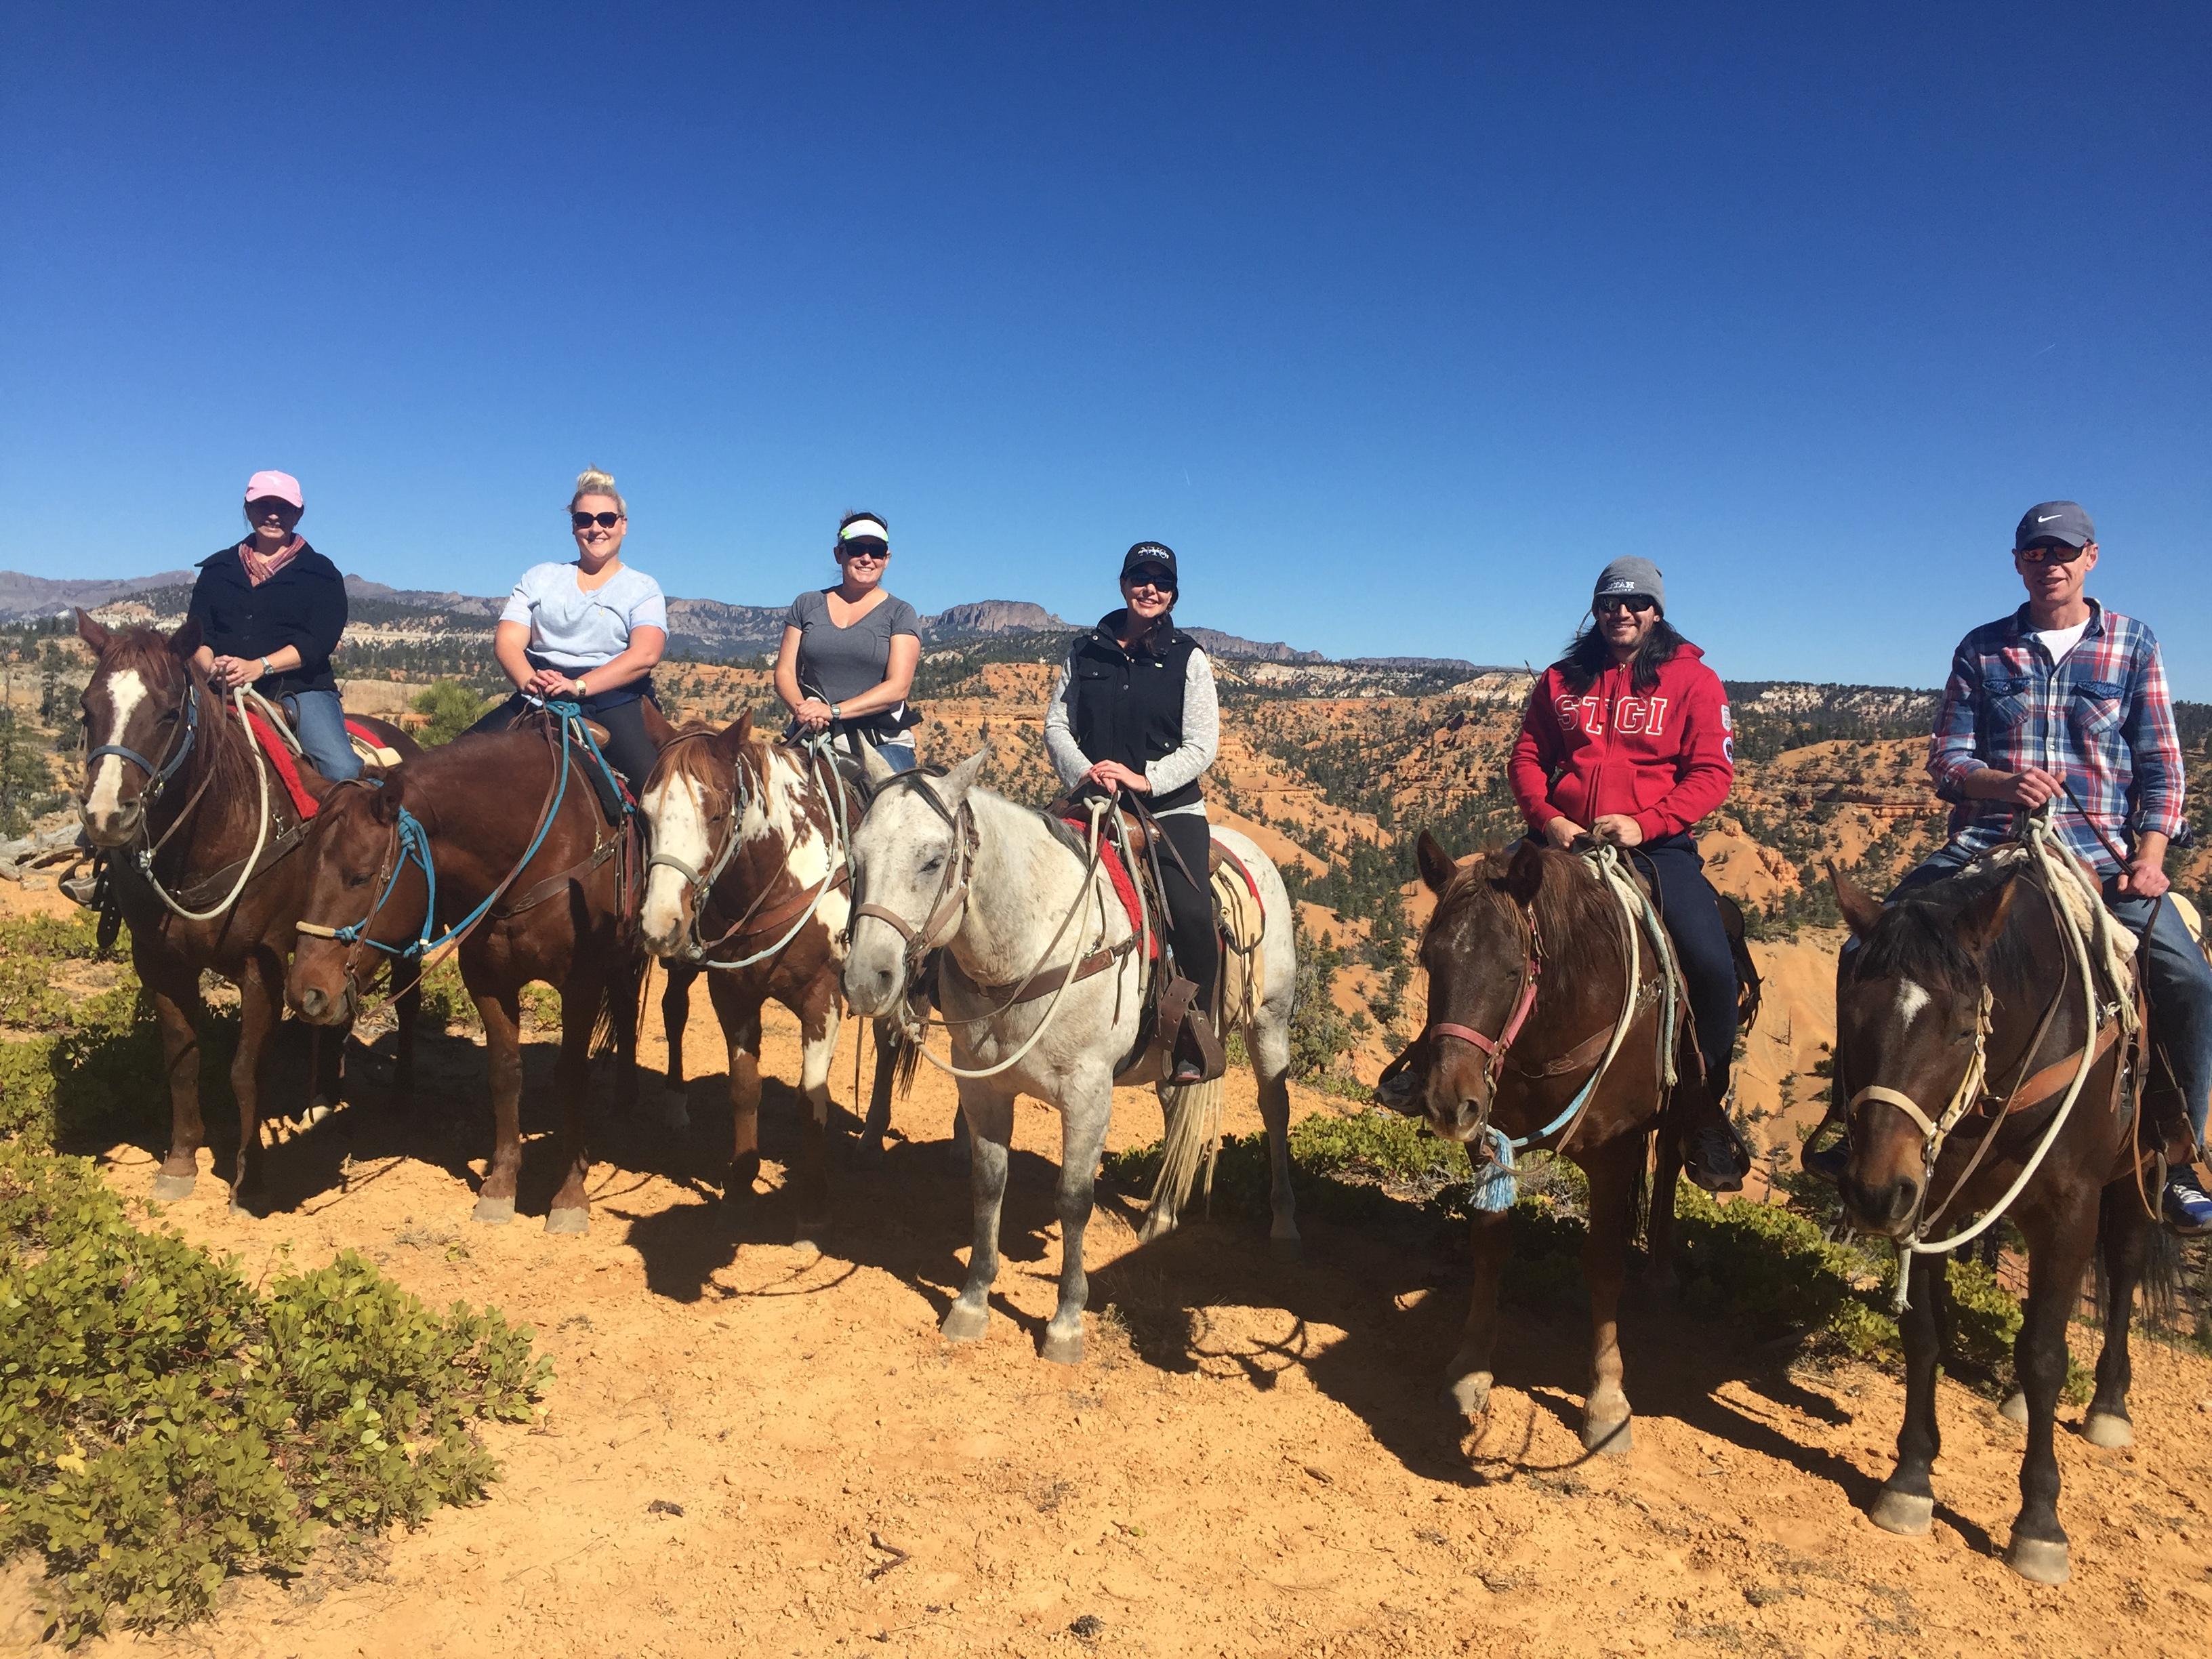 ut-nv-fam-horseback-riding-red-canyon-utah